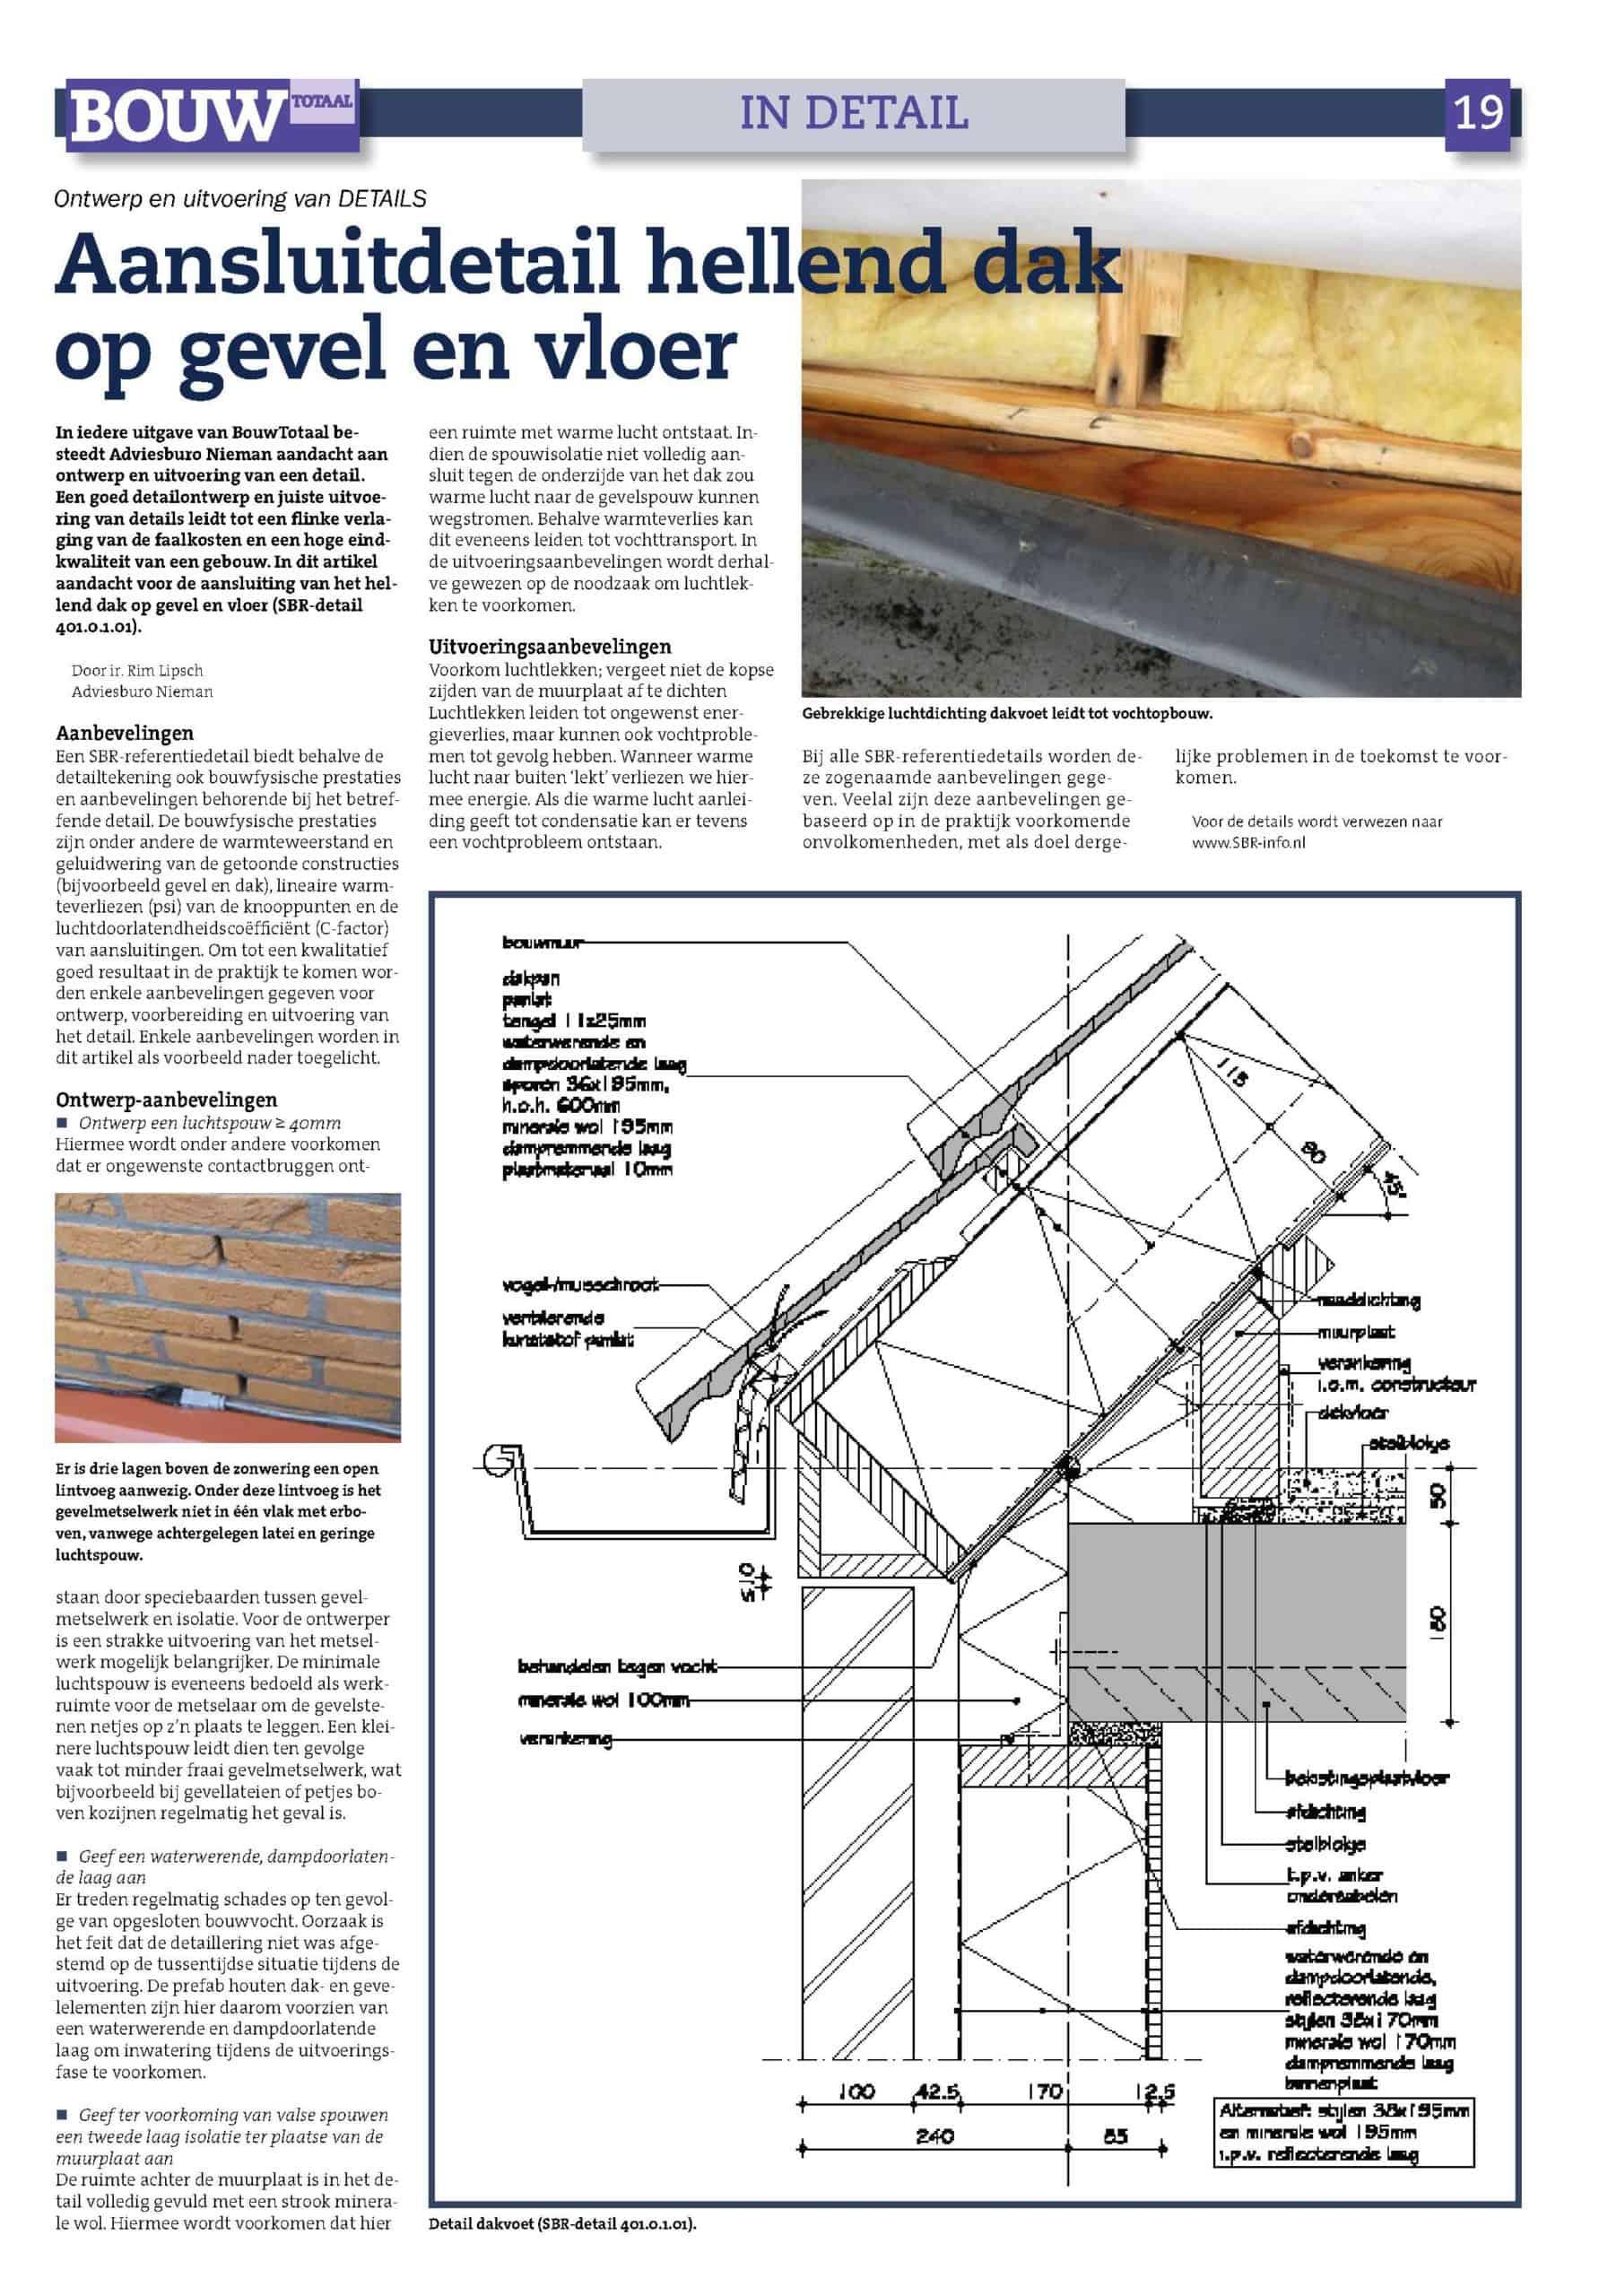 Bouwtotaal_BT.11.10.Detail_Aansluit-detail-hellend-dak-op-gevel-en-vloer_RLi-3-scaled